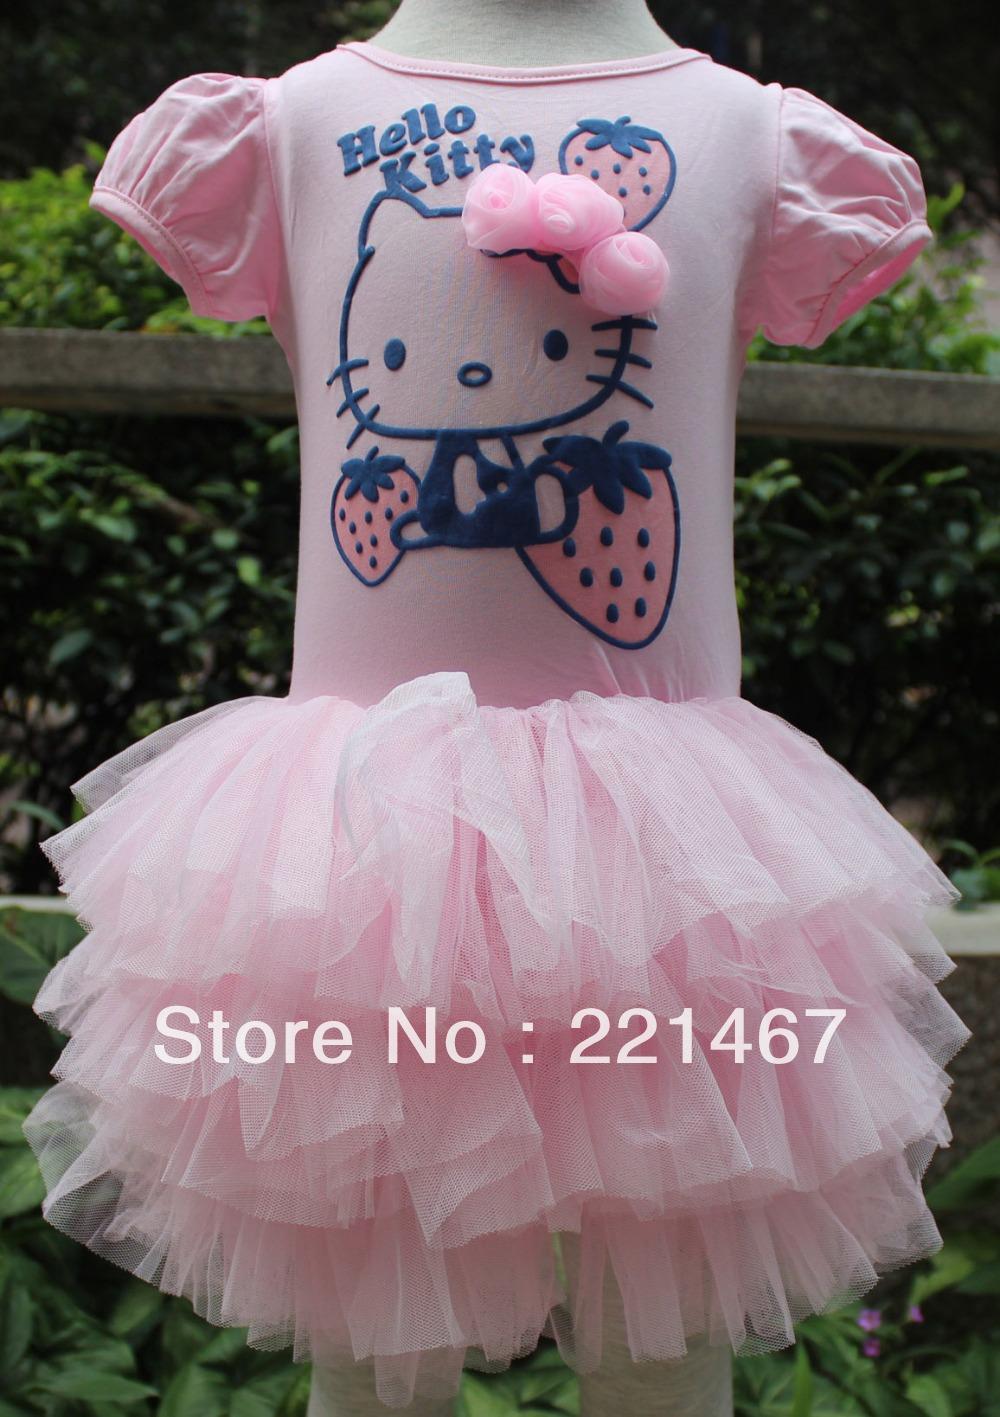 Retail new summer cartoon hello kitty girl dress girl dress high quality children's clothing a free shipping AH013(China (Mainland))